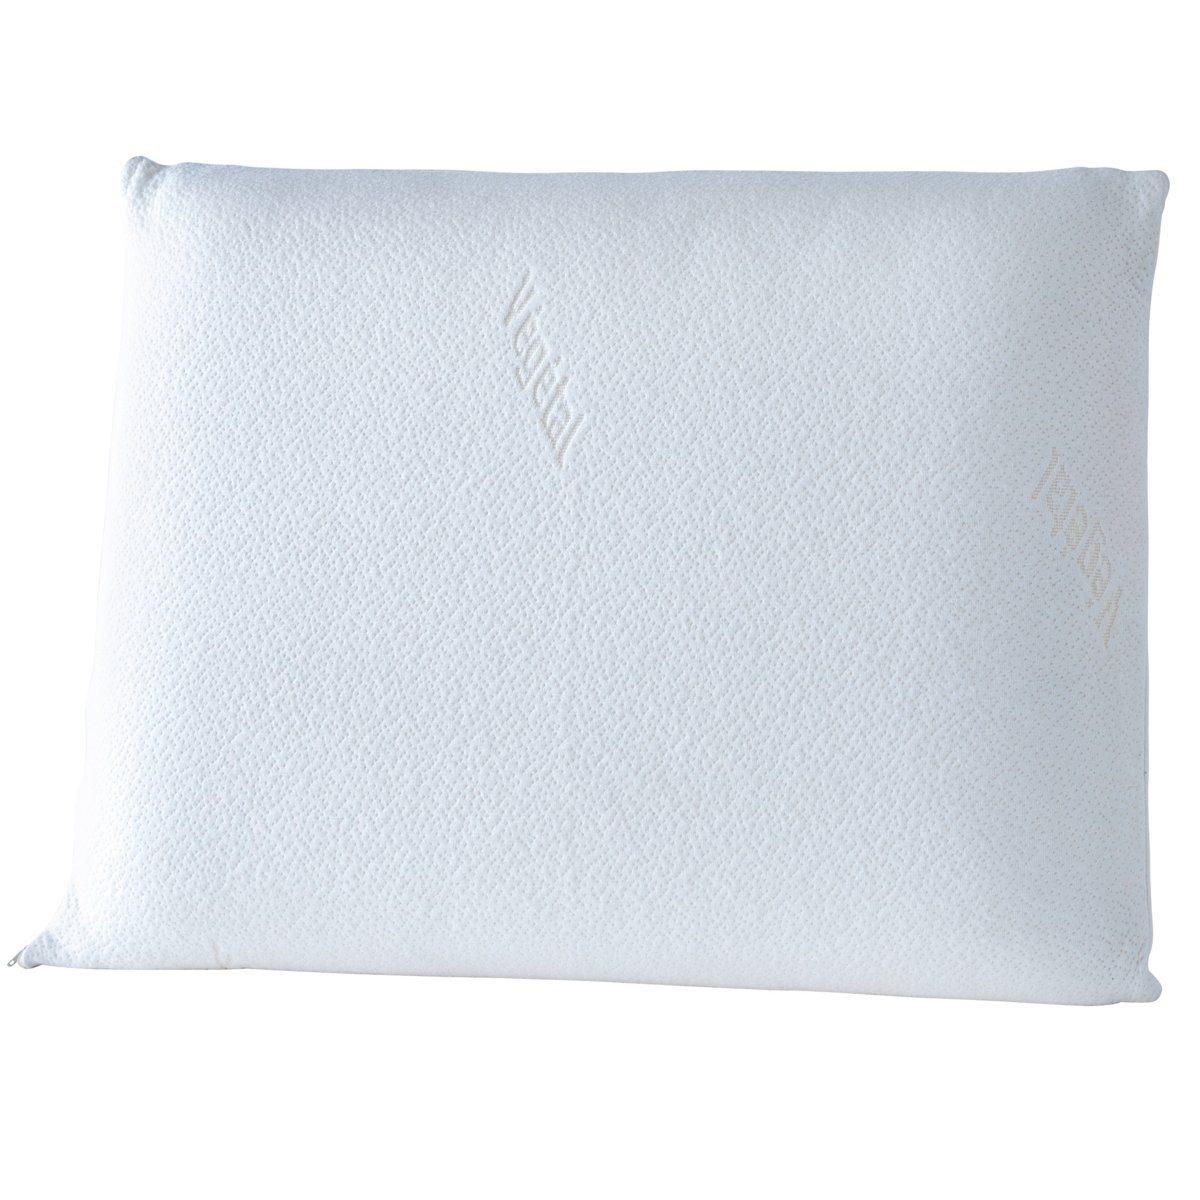 Подушка безворсовая с памятью формы подушки fabe высокая подушка с памятью формы memo classic 16